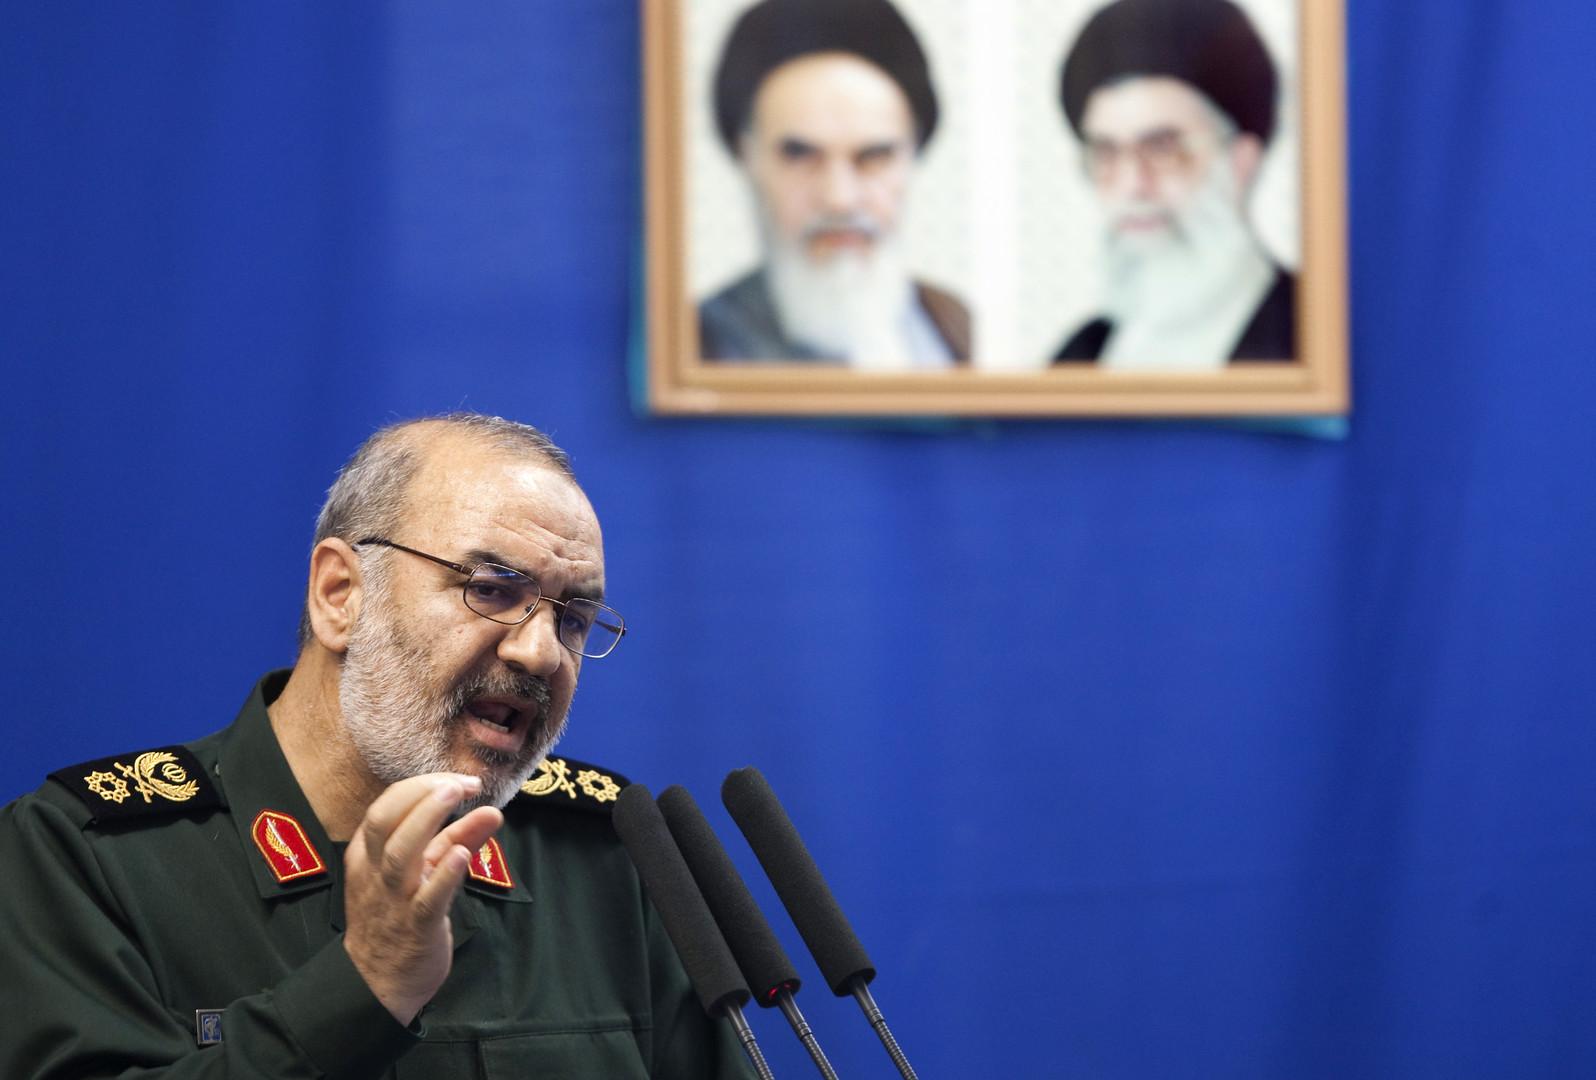 خامنئي يعين نائبا جديدا لقائد الحرس الثوري